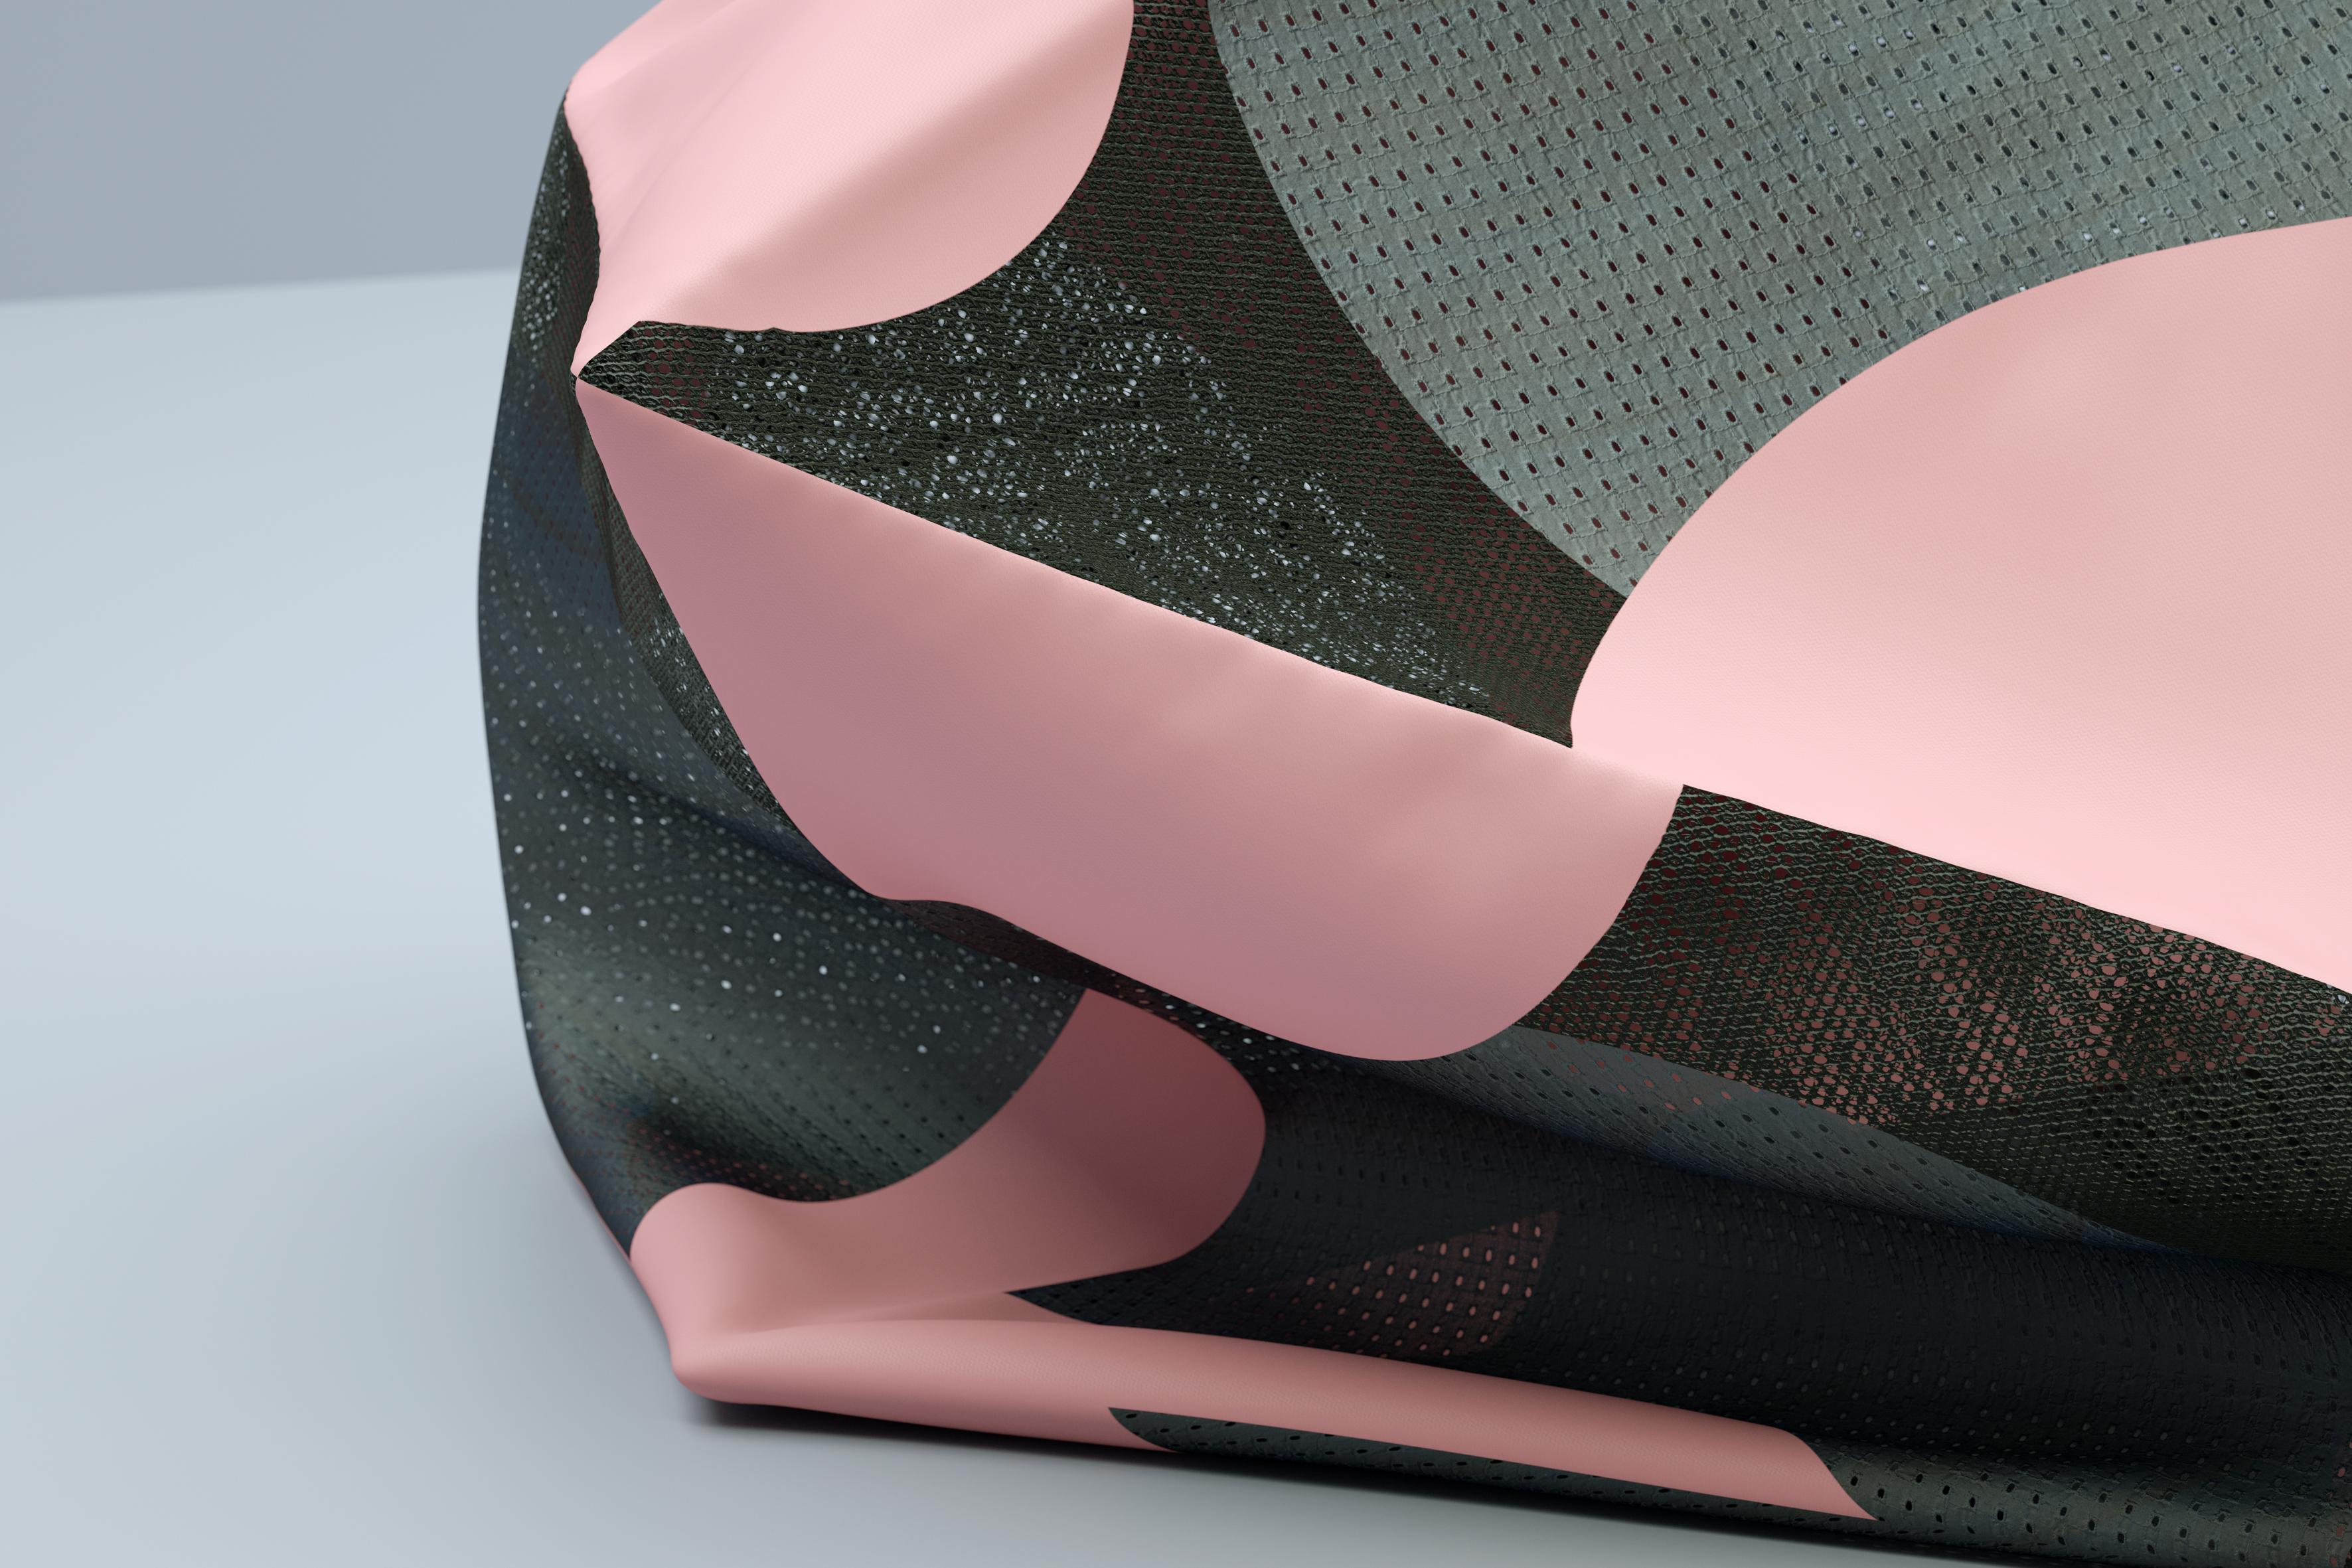 Andreas_Barden_Set_Textilesculpture_Image03